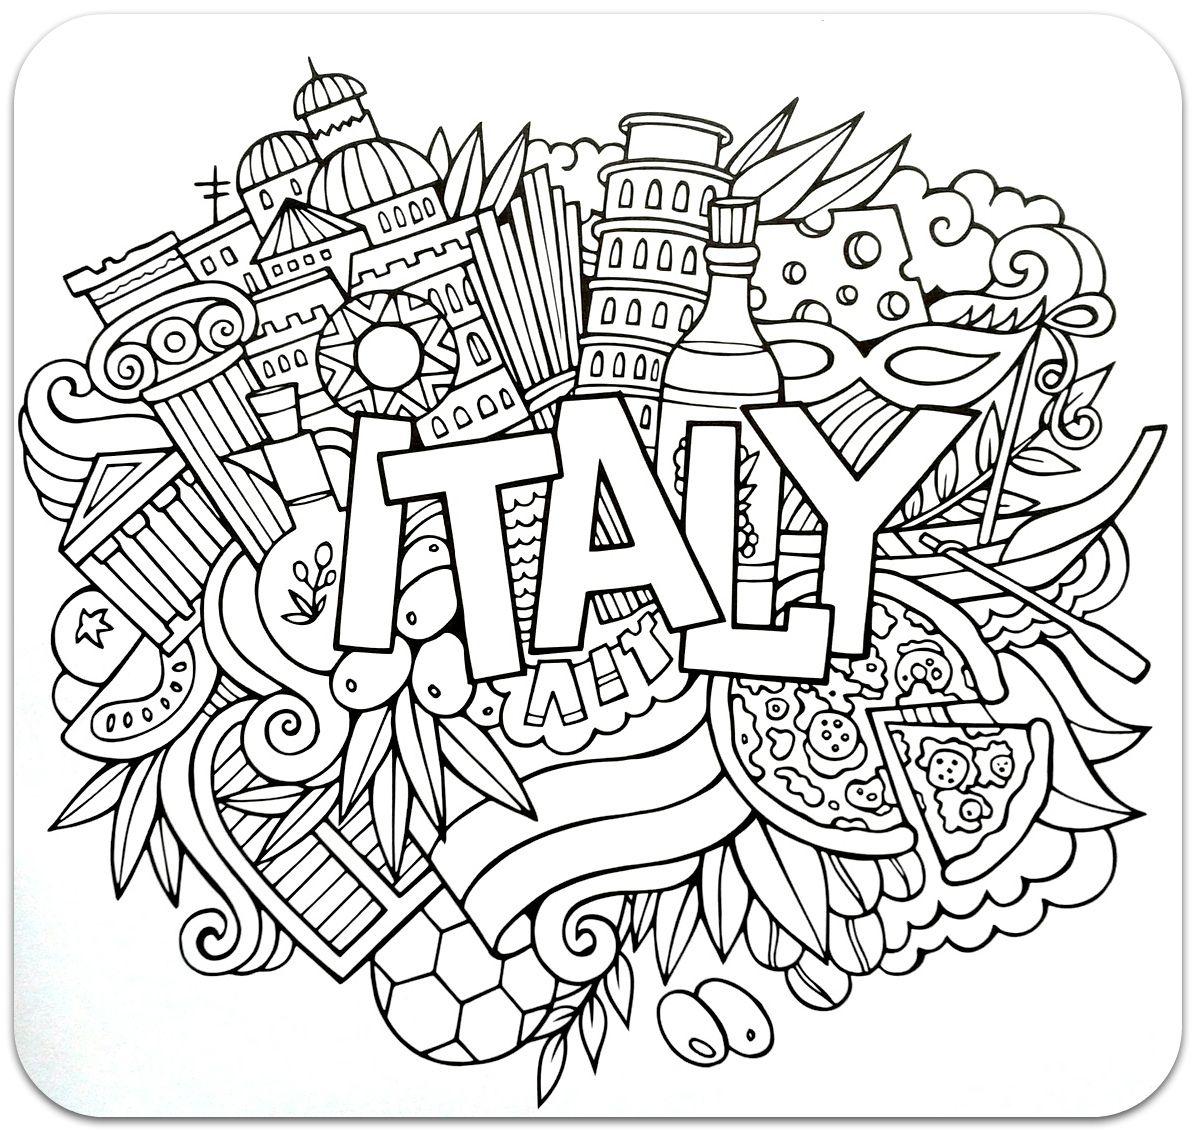 Розмальовки-антистрес. Країни (частина 1) | Раскраски ...